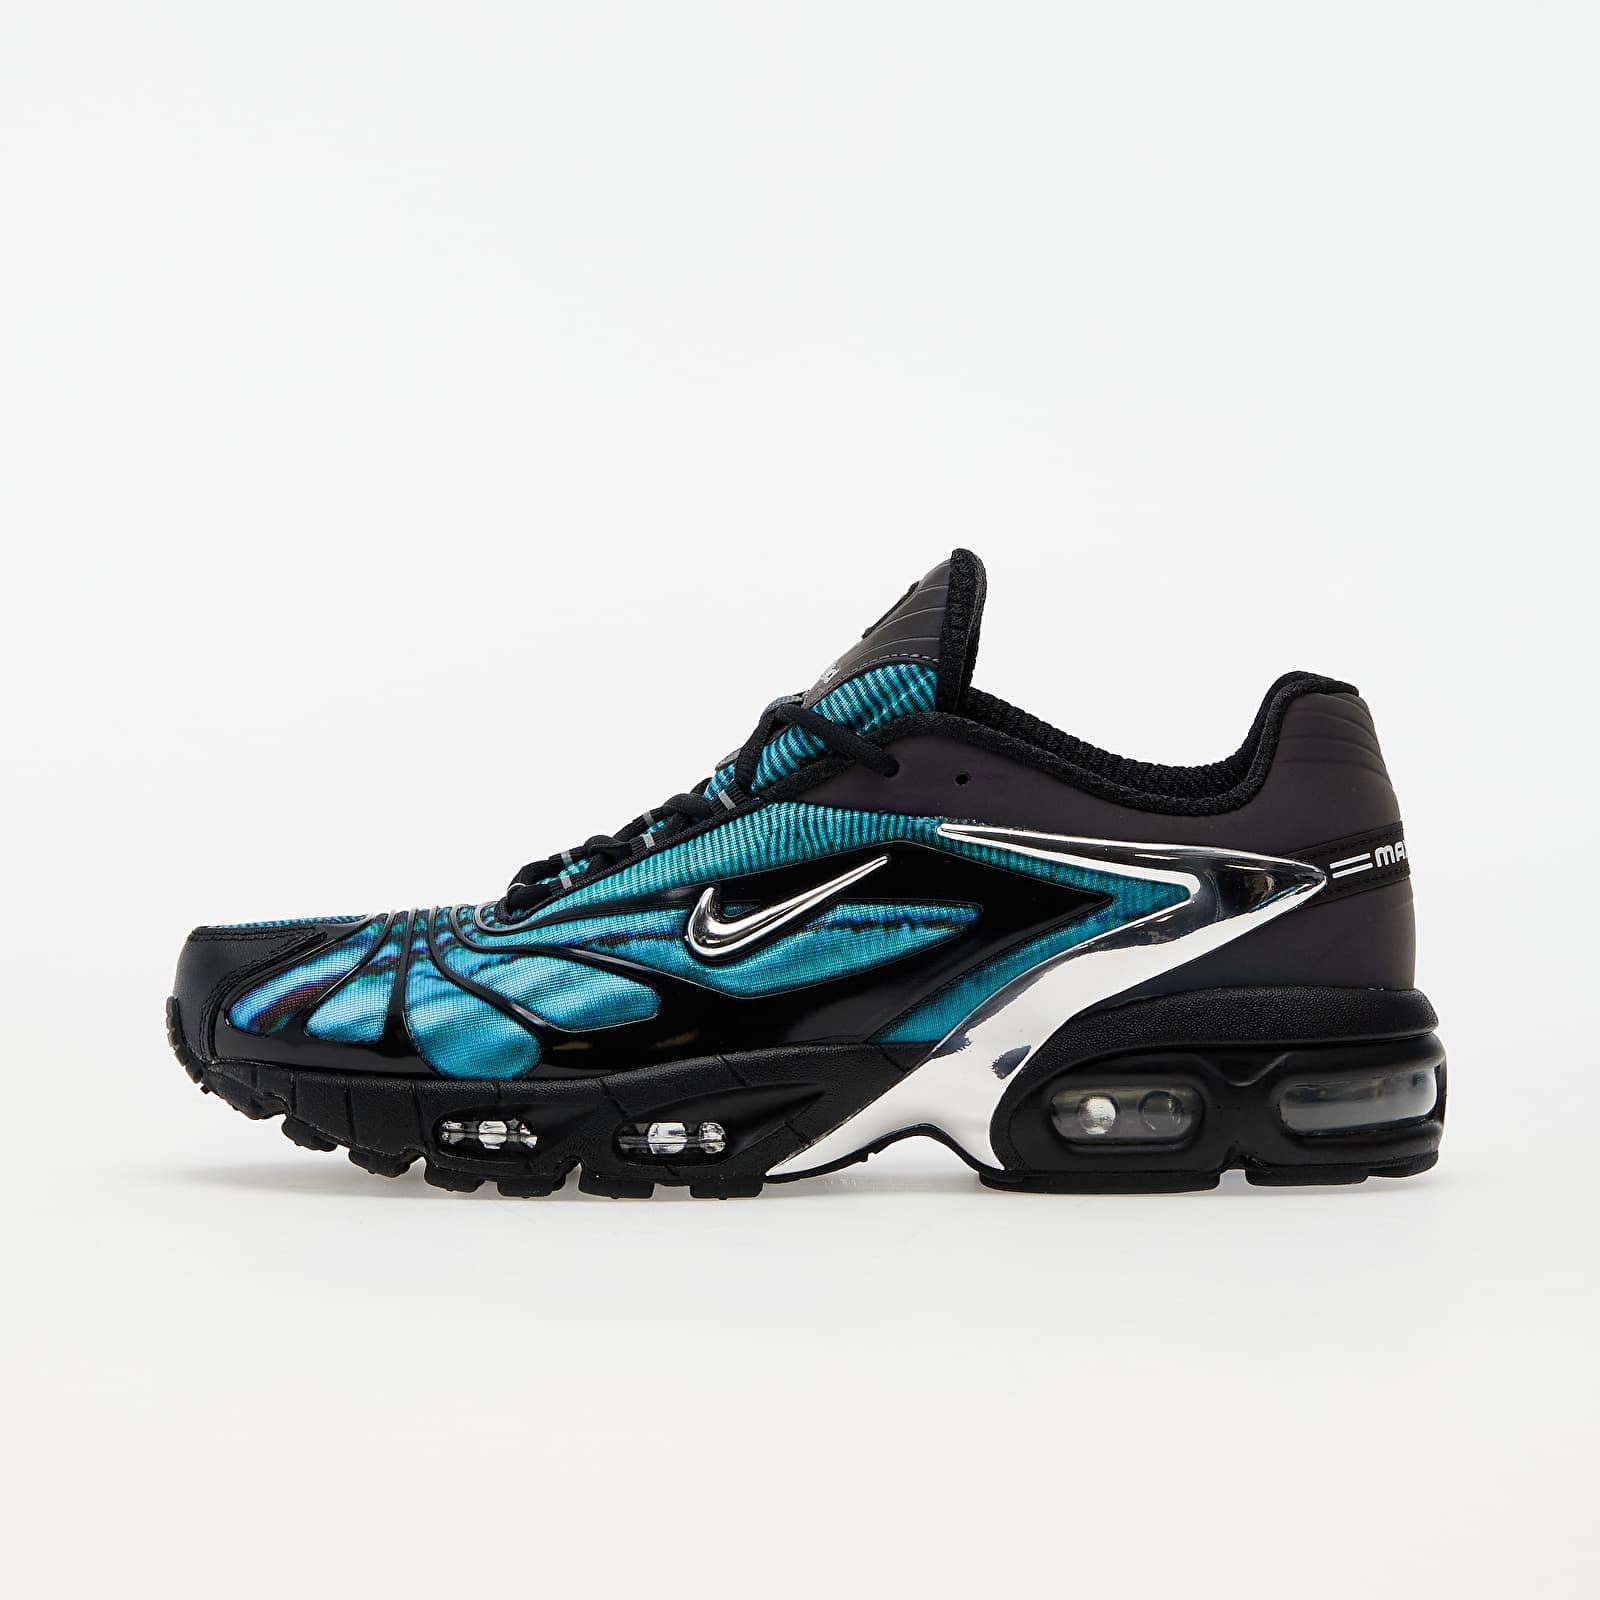 Nike x Skepta Air Max Tailwind V Black/ Chrome EUR 45